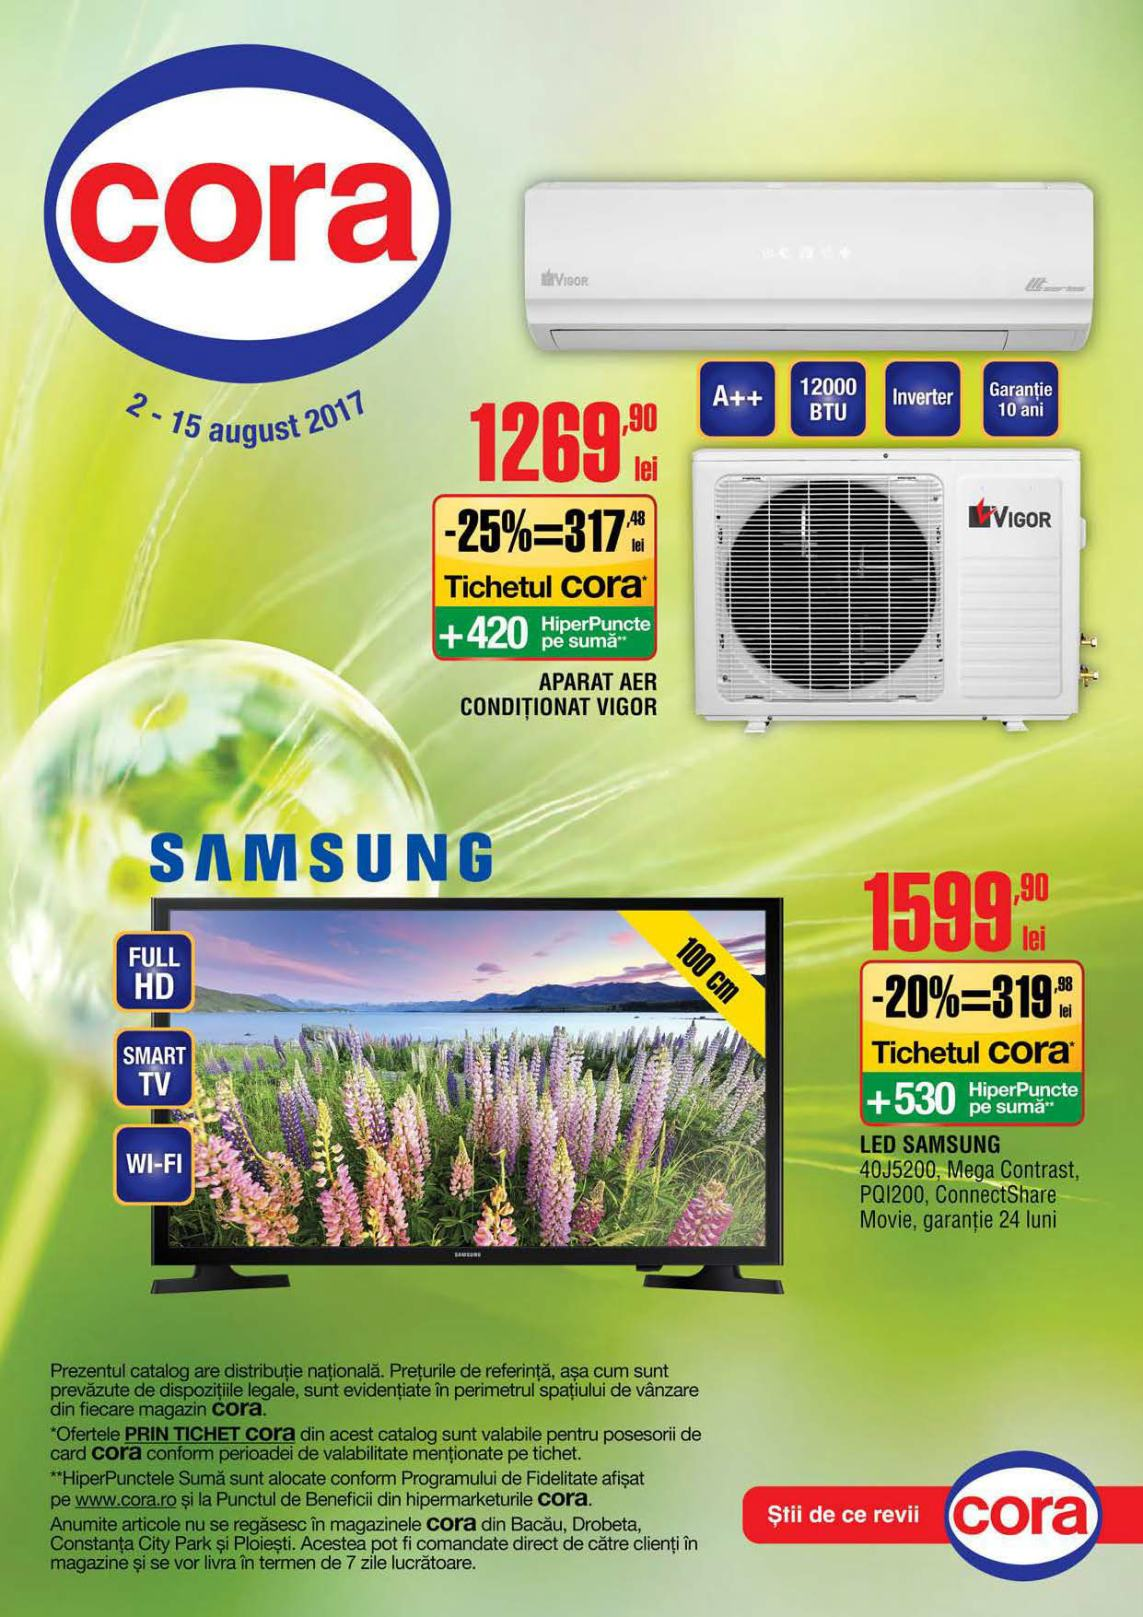 Catalog Cora oferte 2 august - 15 august 2017 Produse nealimentare